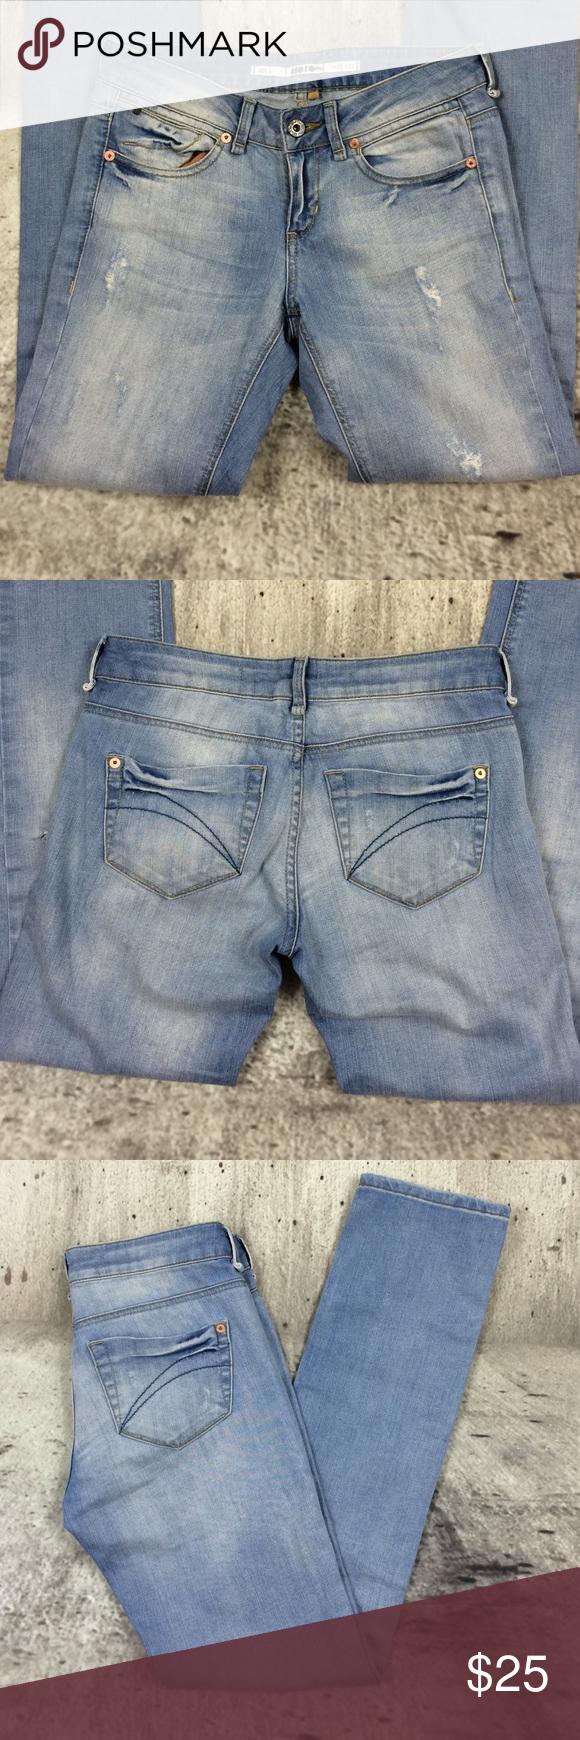 "Topshop moto destroyer jeans Topshop moto destroyer jeans  cotton and spandex blend inseam 32"" rise 7.5"" Topshop Jeans Straight Leg"